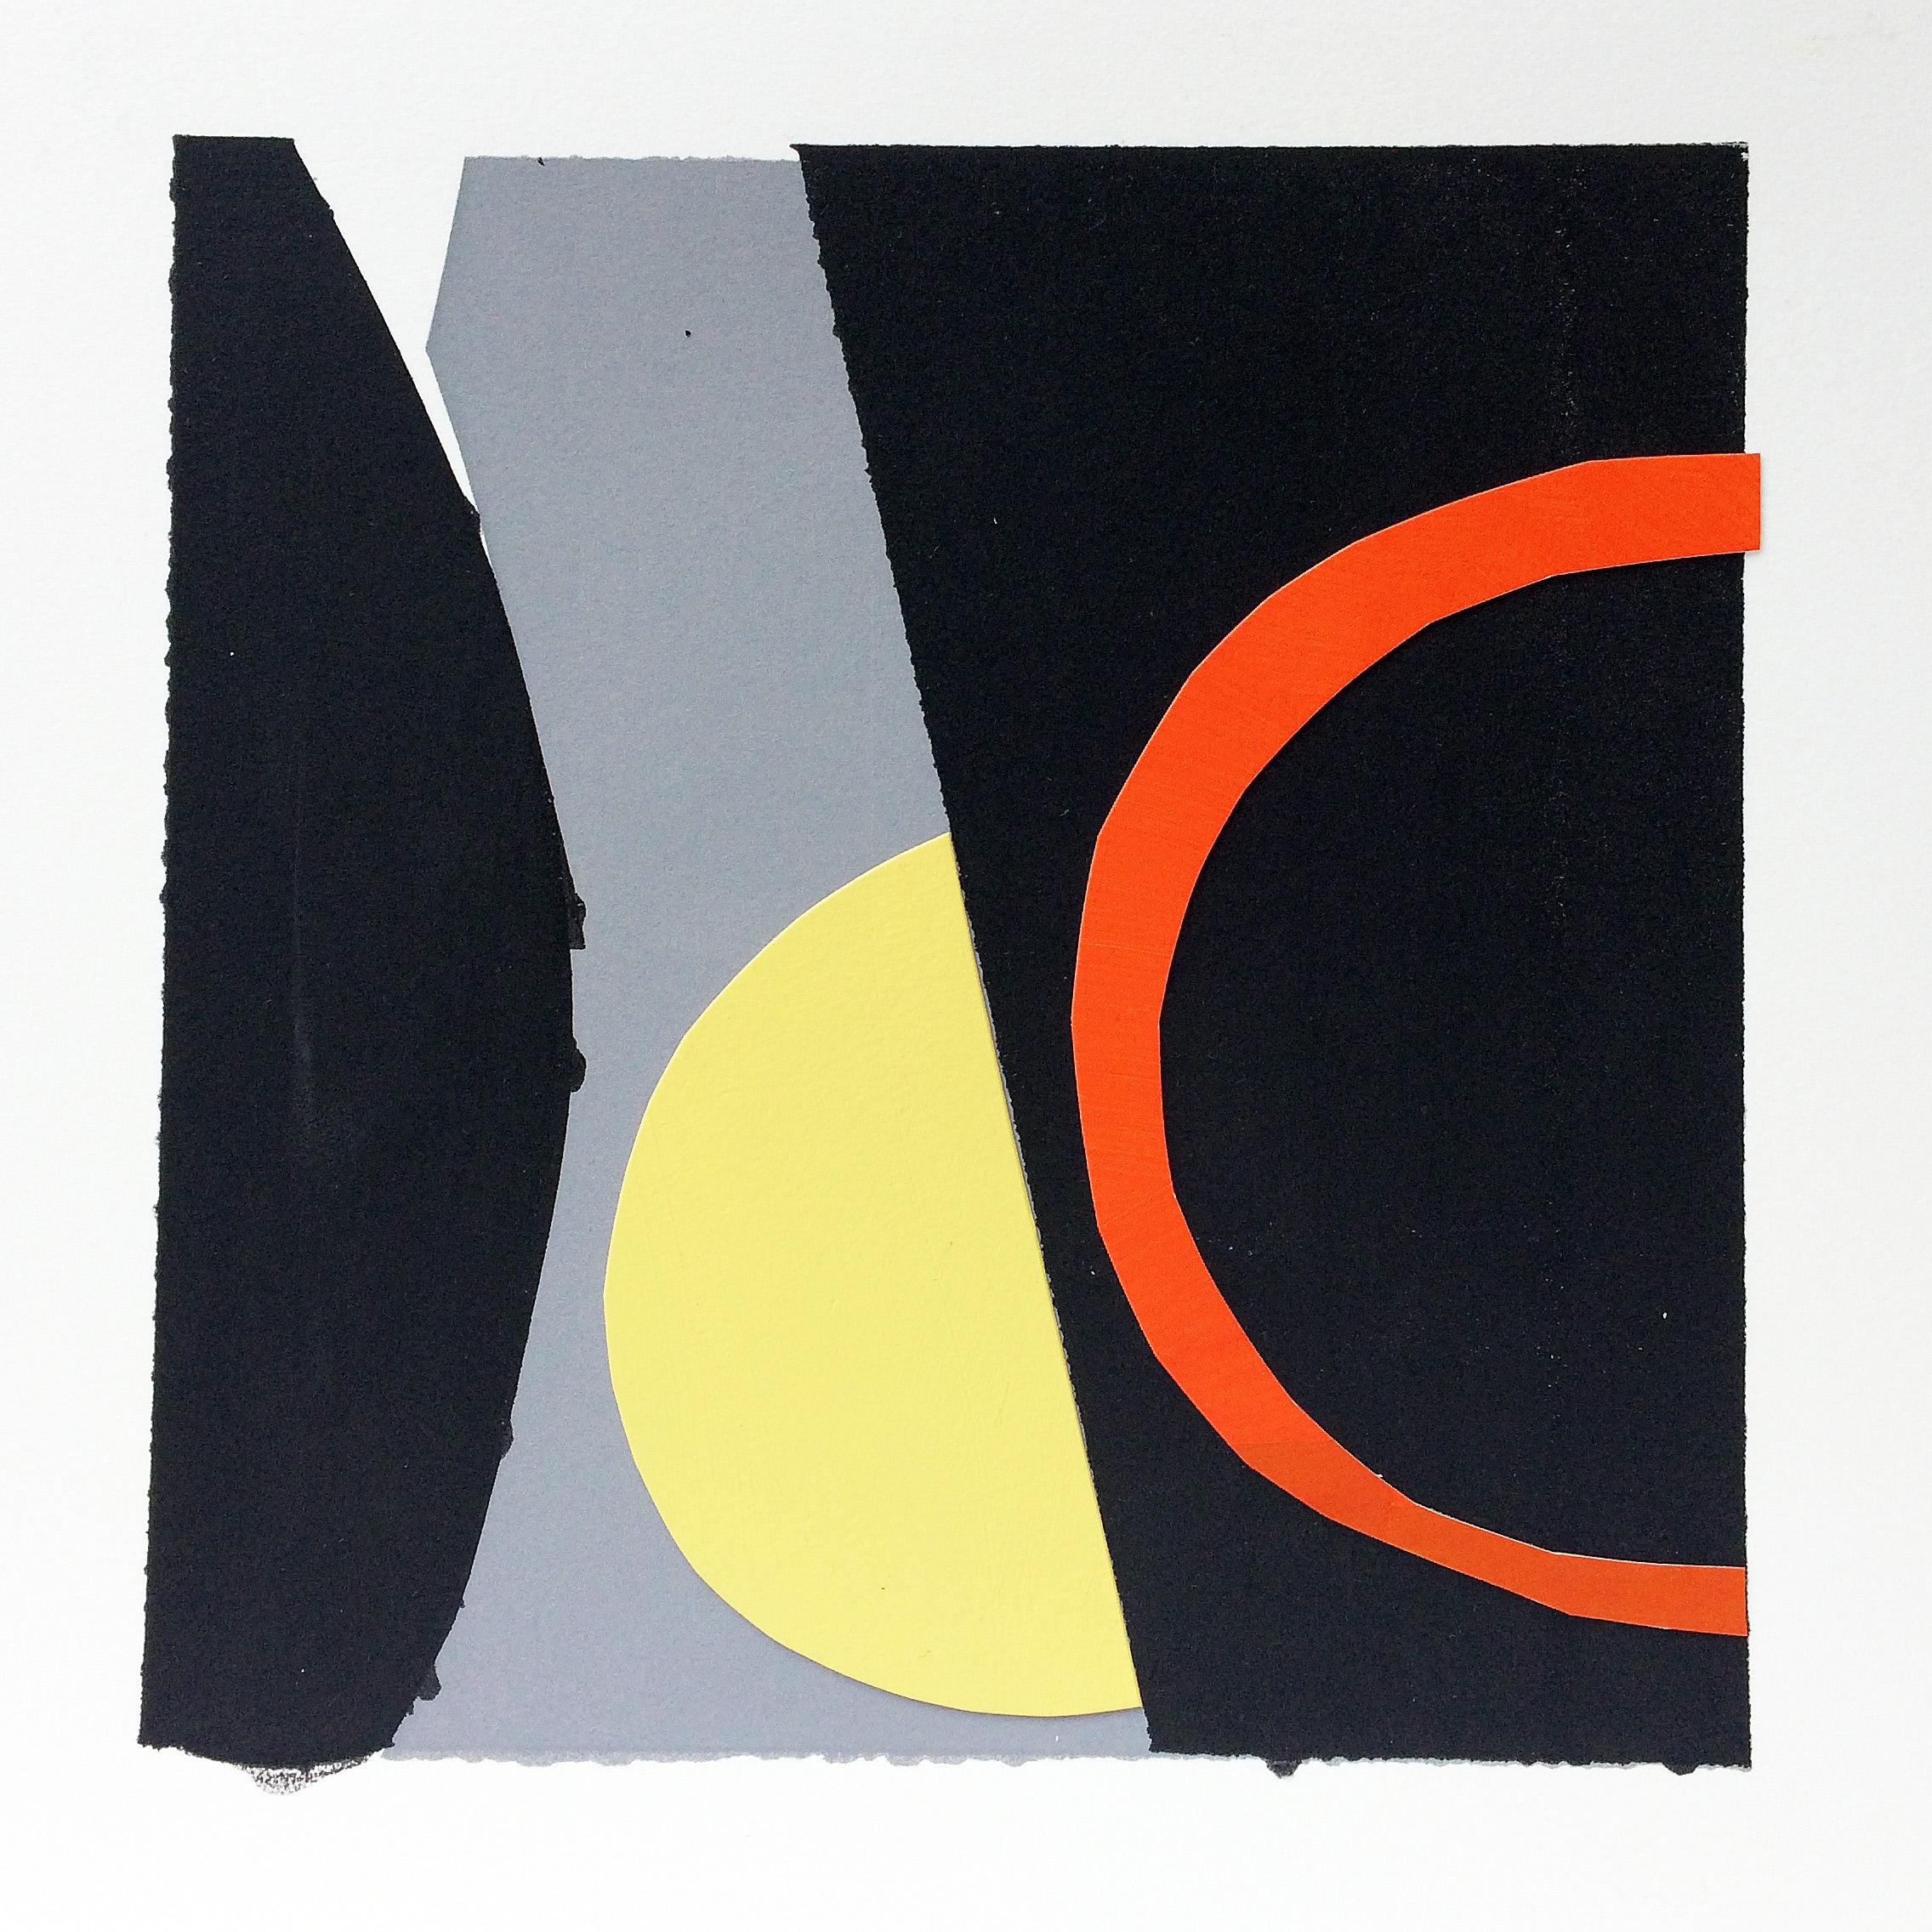 Artwork - Untitled Monoprint Print | Stephen Robson - Monoprint